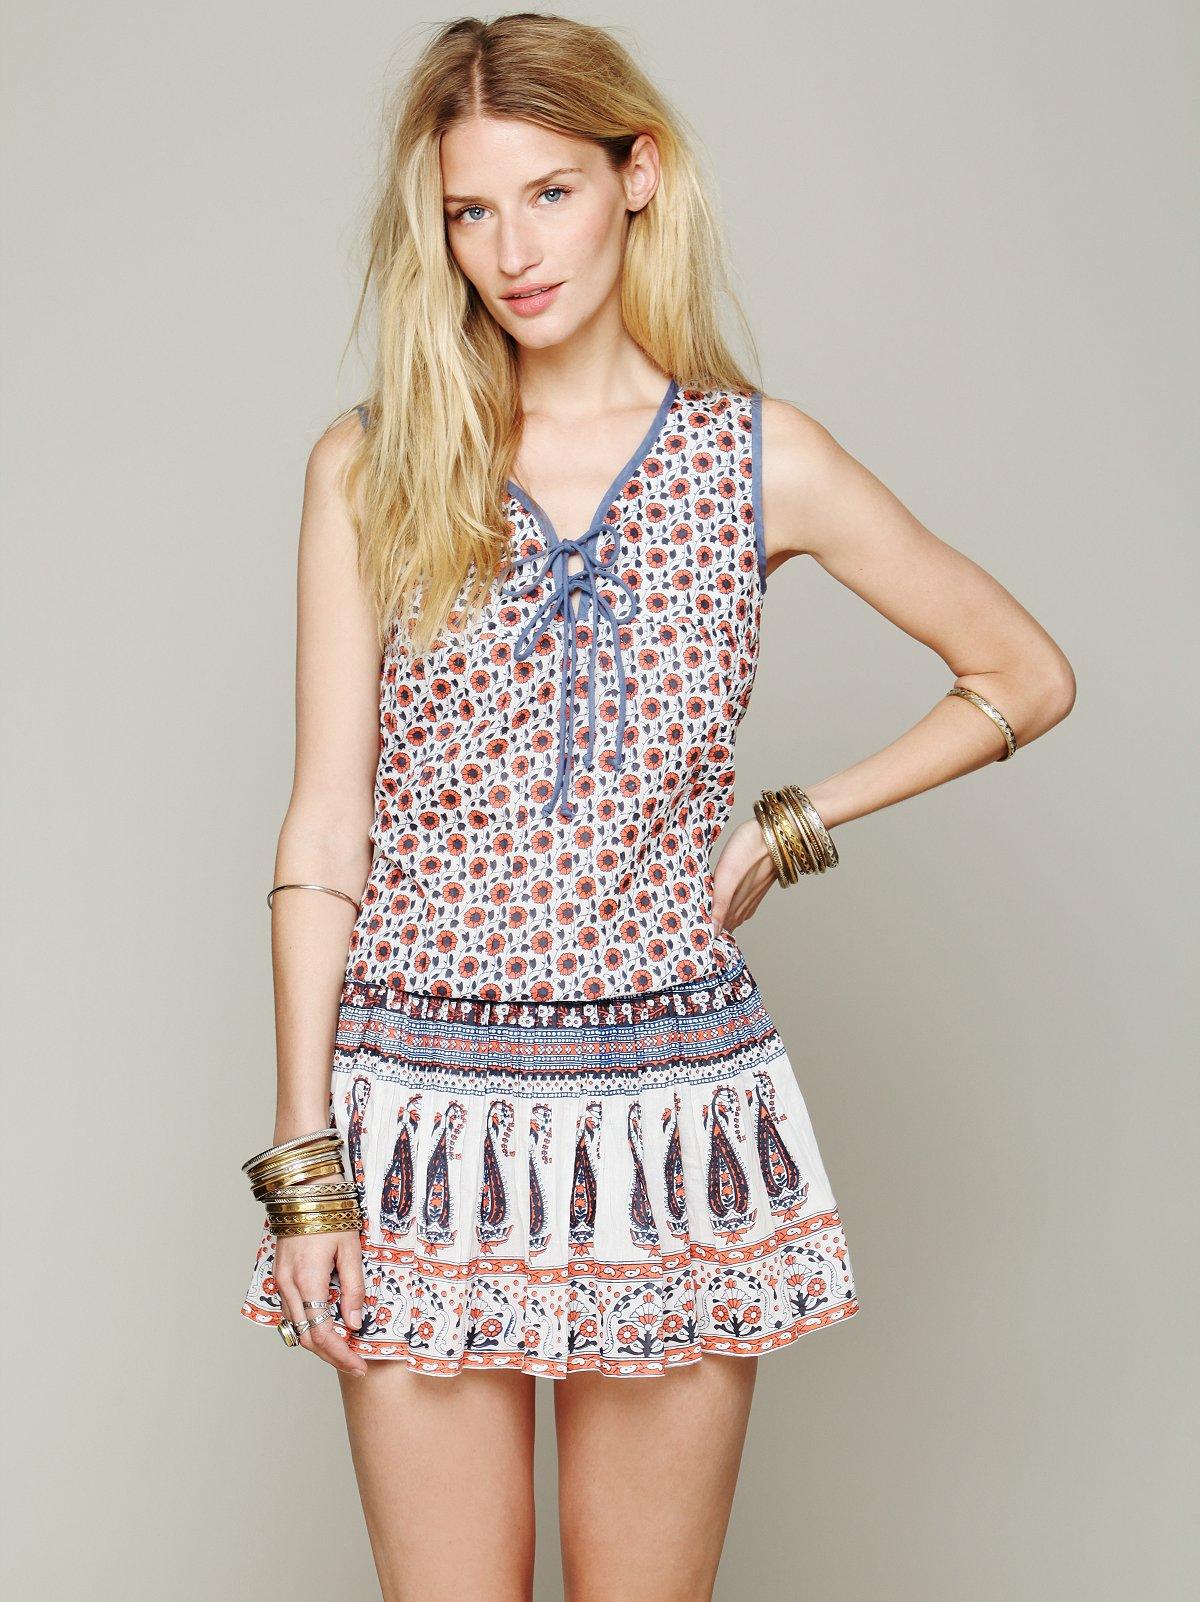 Coachella Mini Dress